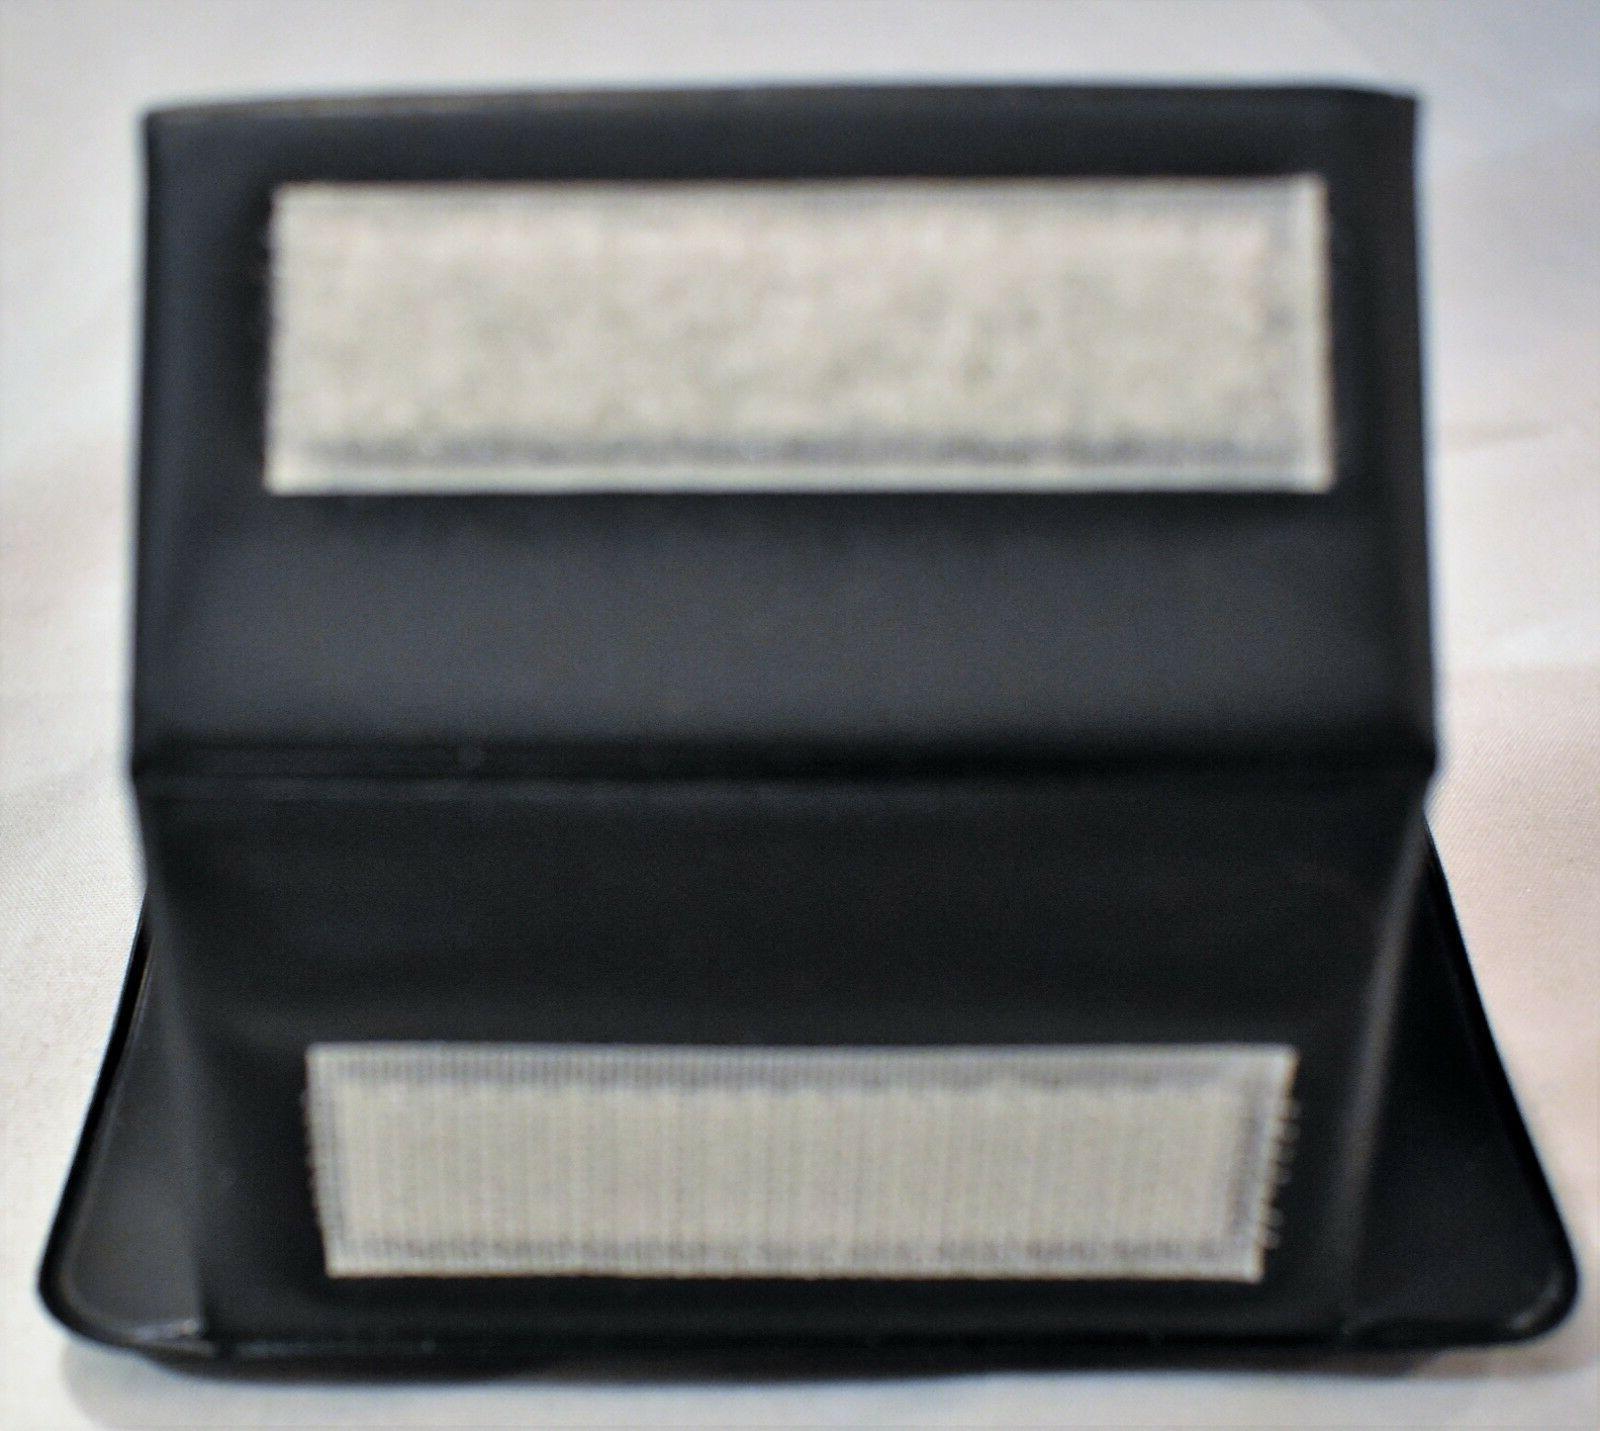 JOTO Universal Waterproof Dry Bag Case Kickstand Black, New,